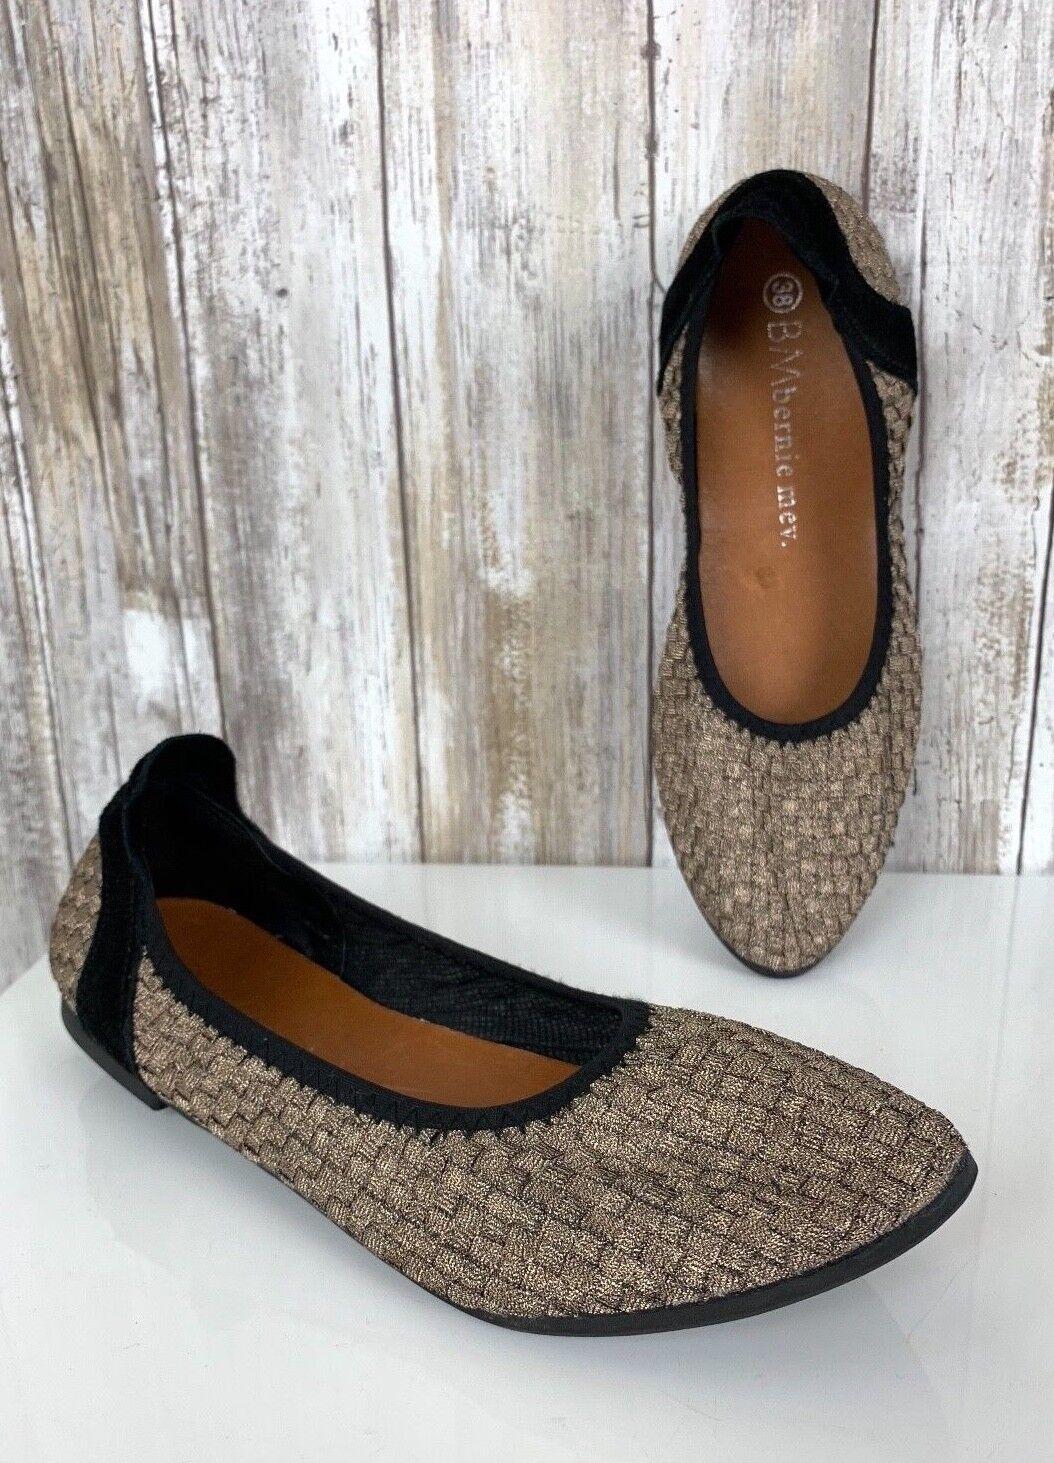 Bernie Mev Women's shoes Slip Ons Woven Semi Pointed Bronze Ballet Flats 38 7.5